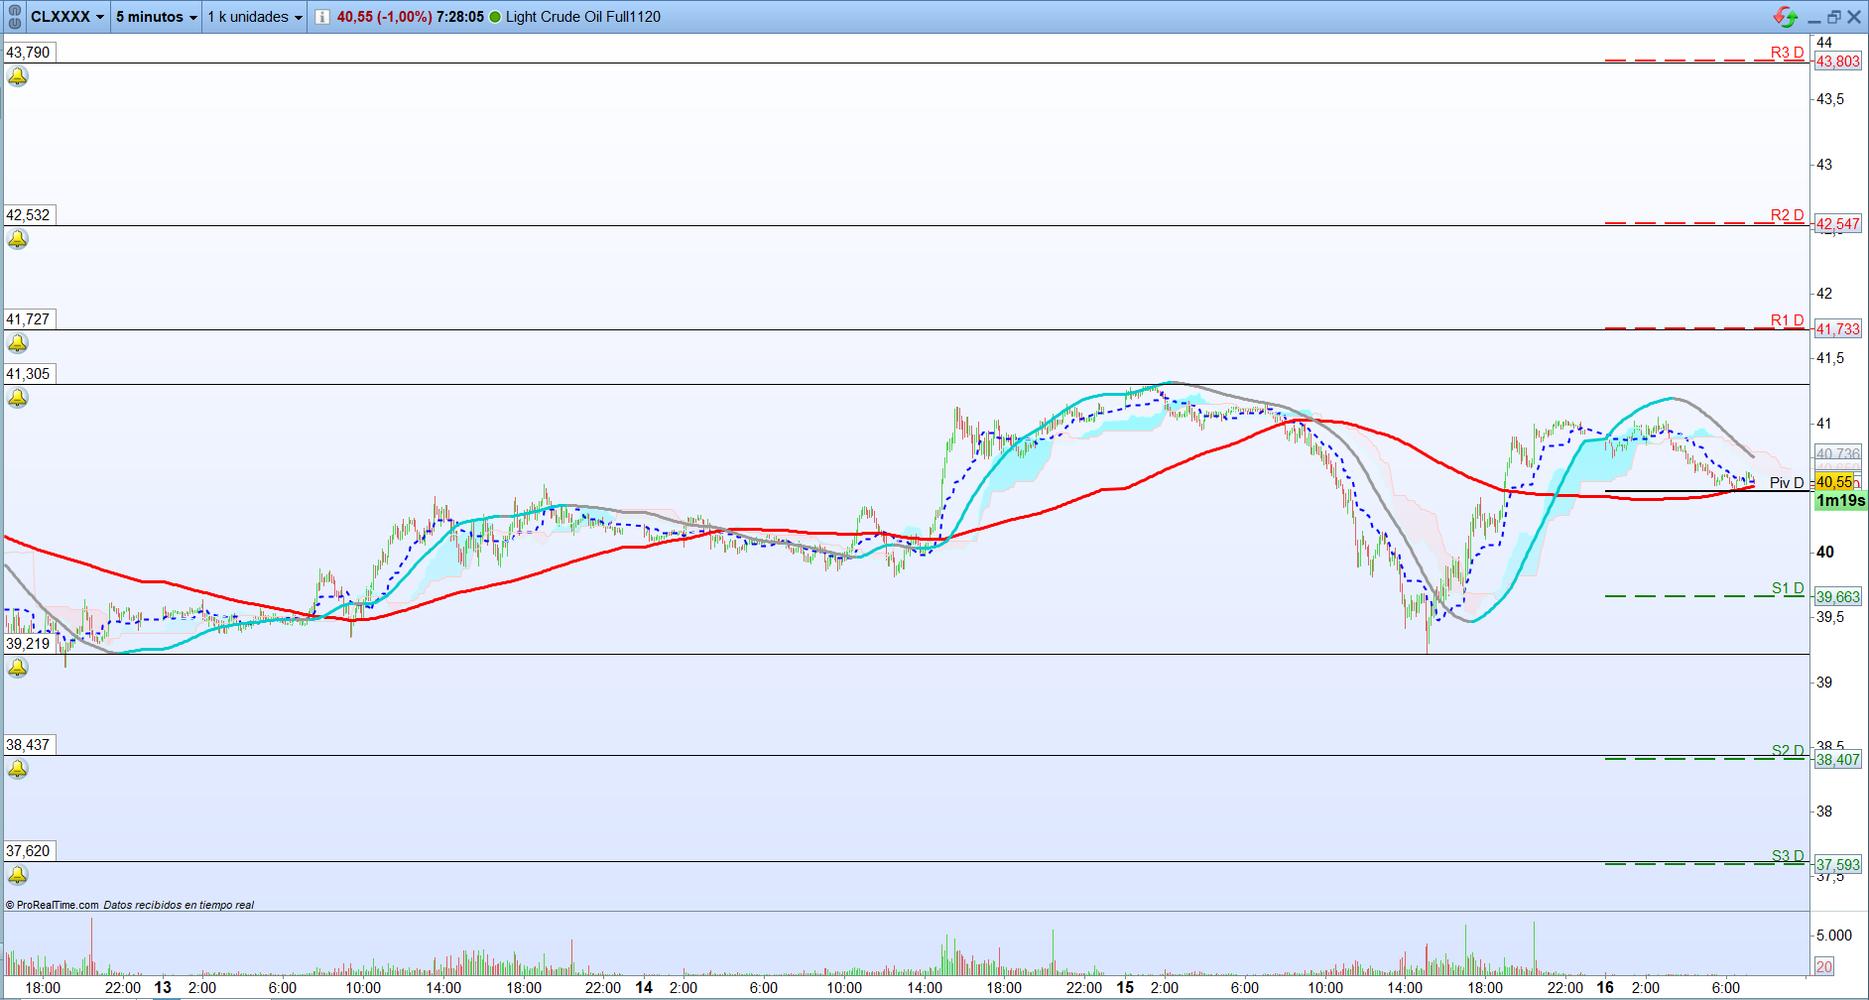 Petróleo: Trading de corto plazo. Scalping